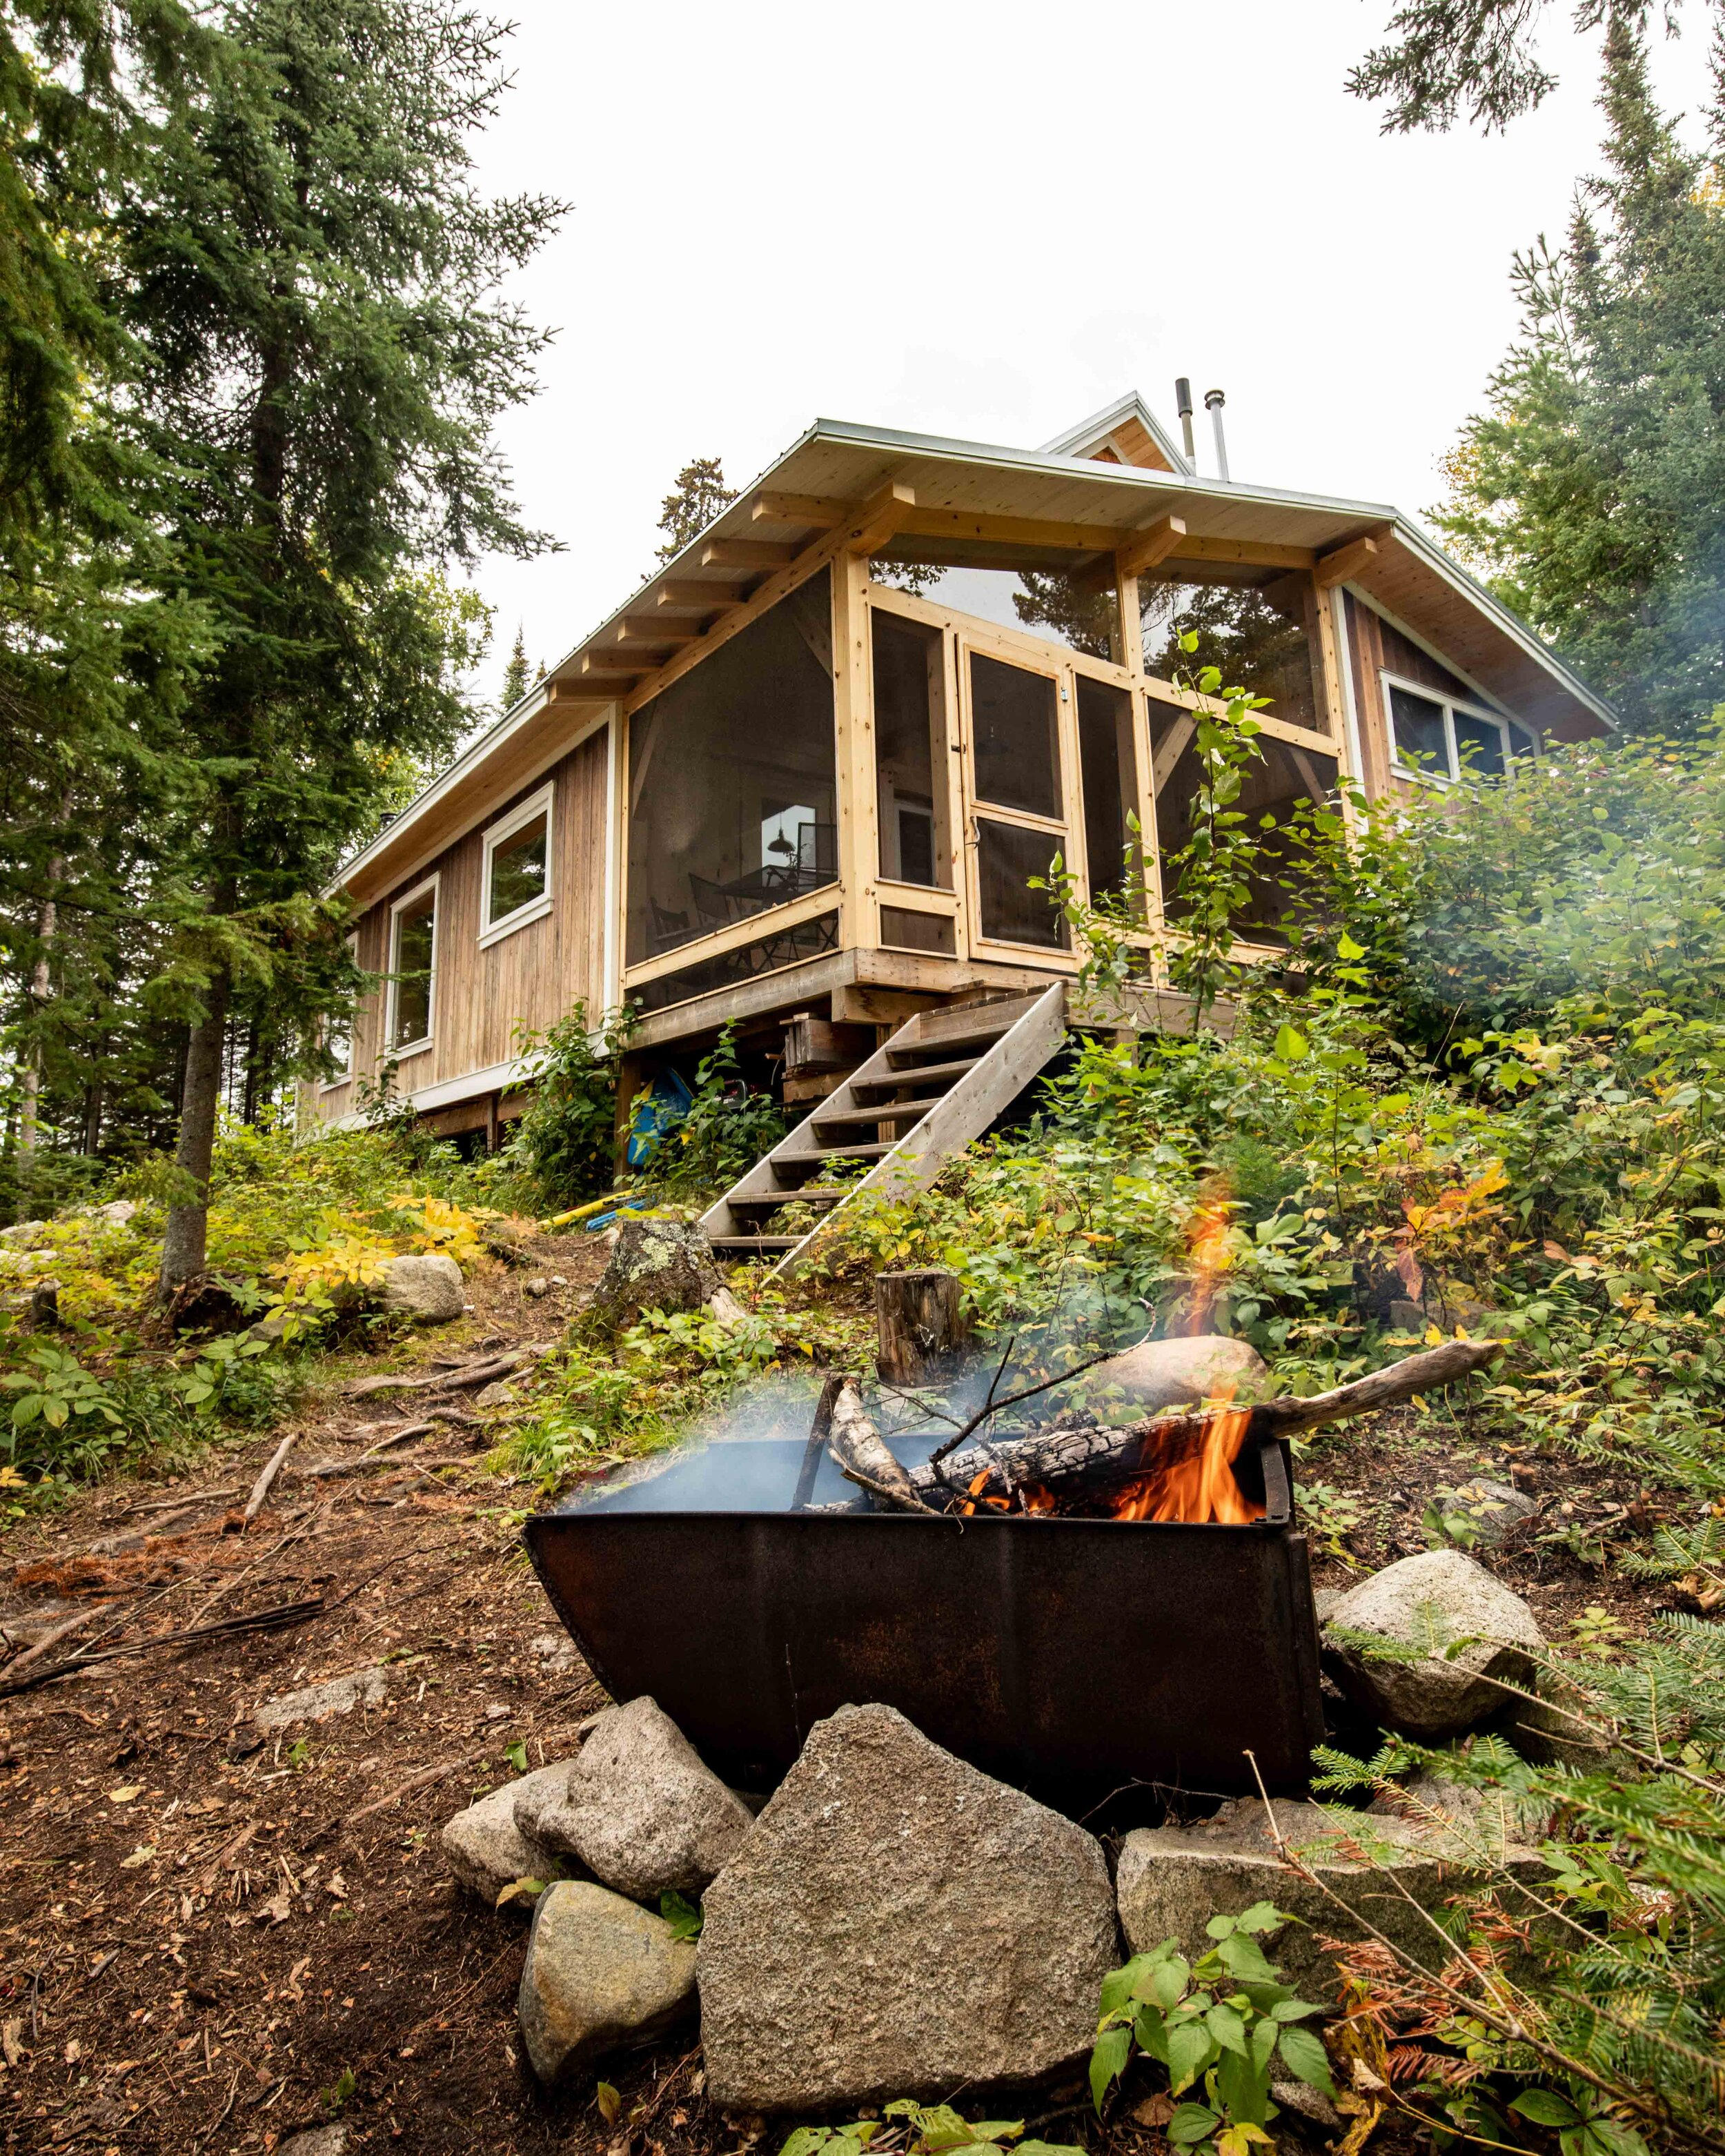 The eco cabins at Falcon Trails